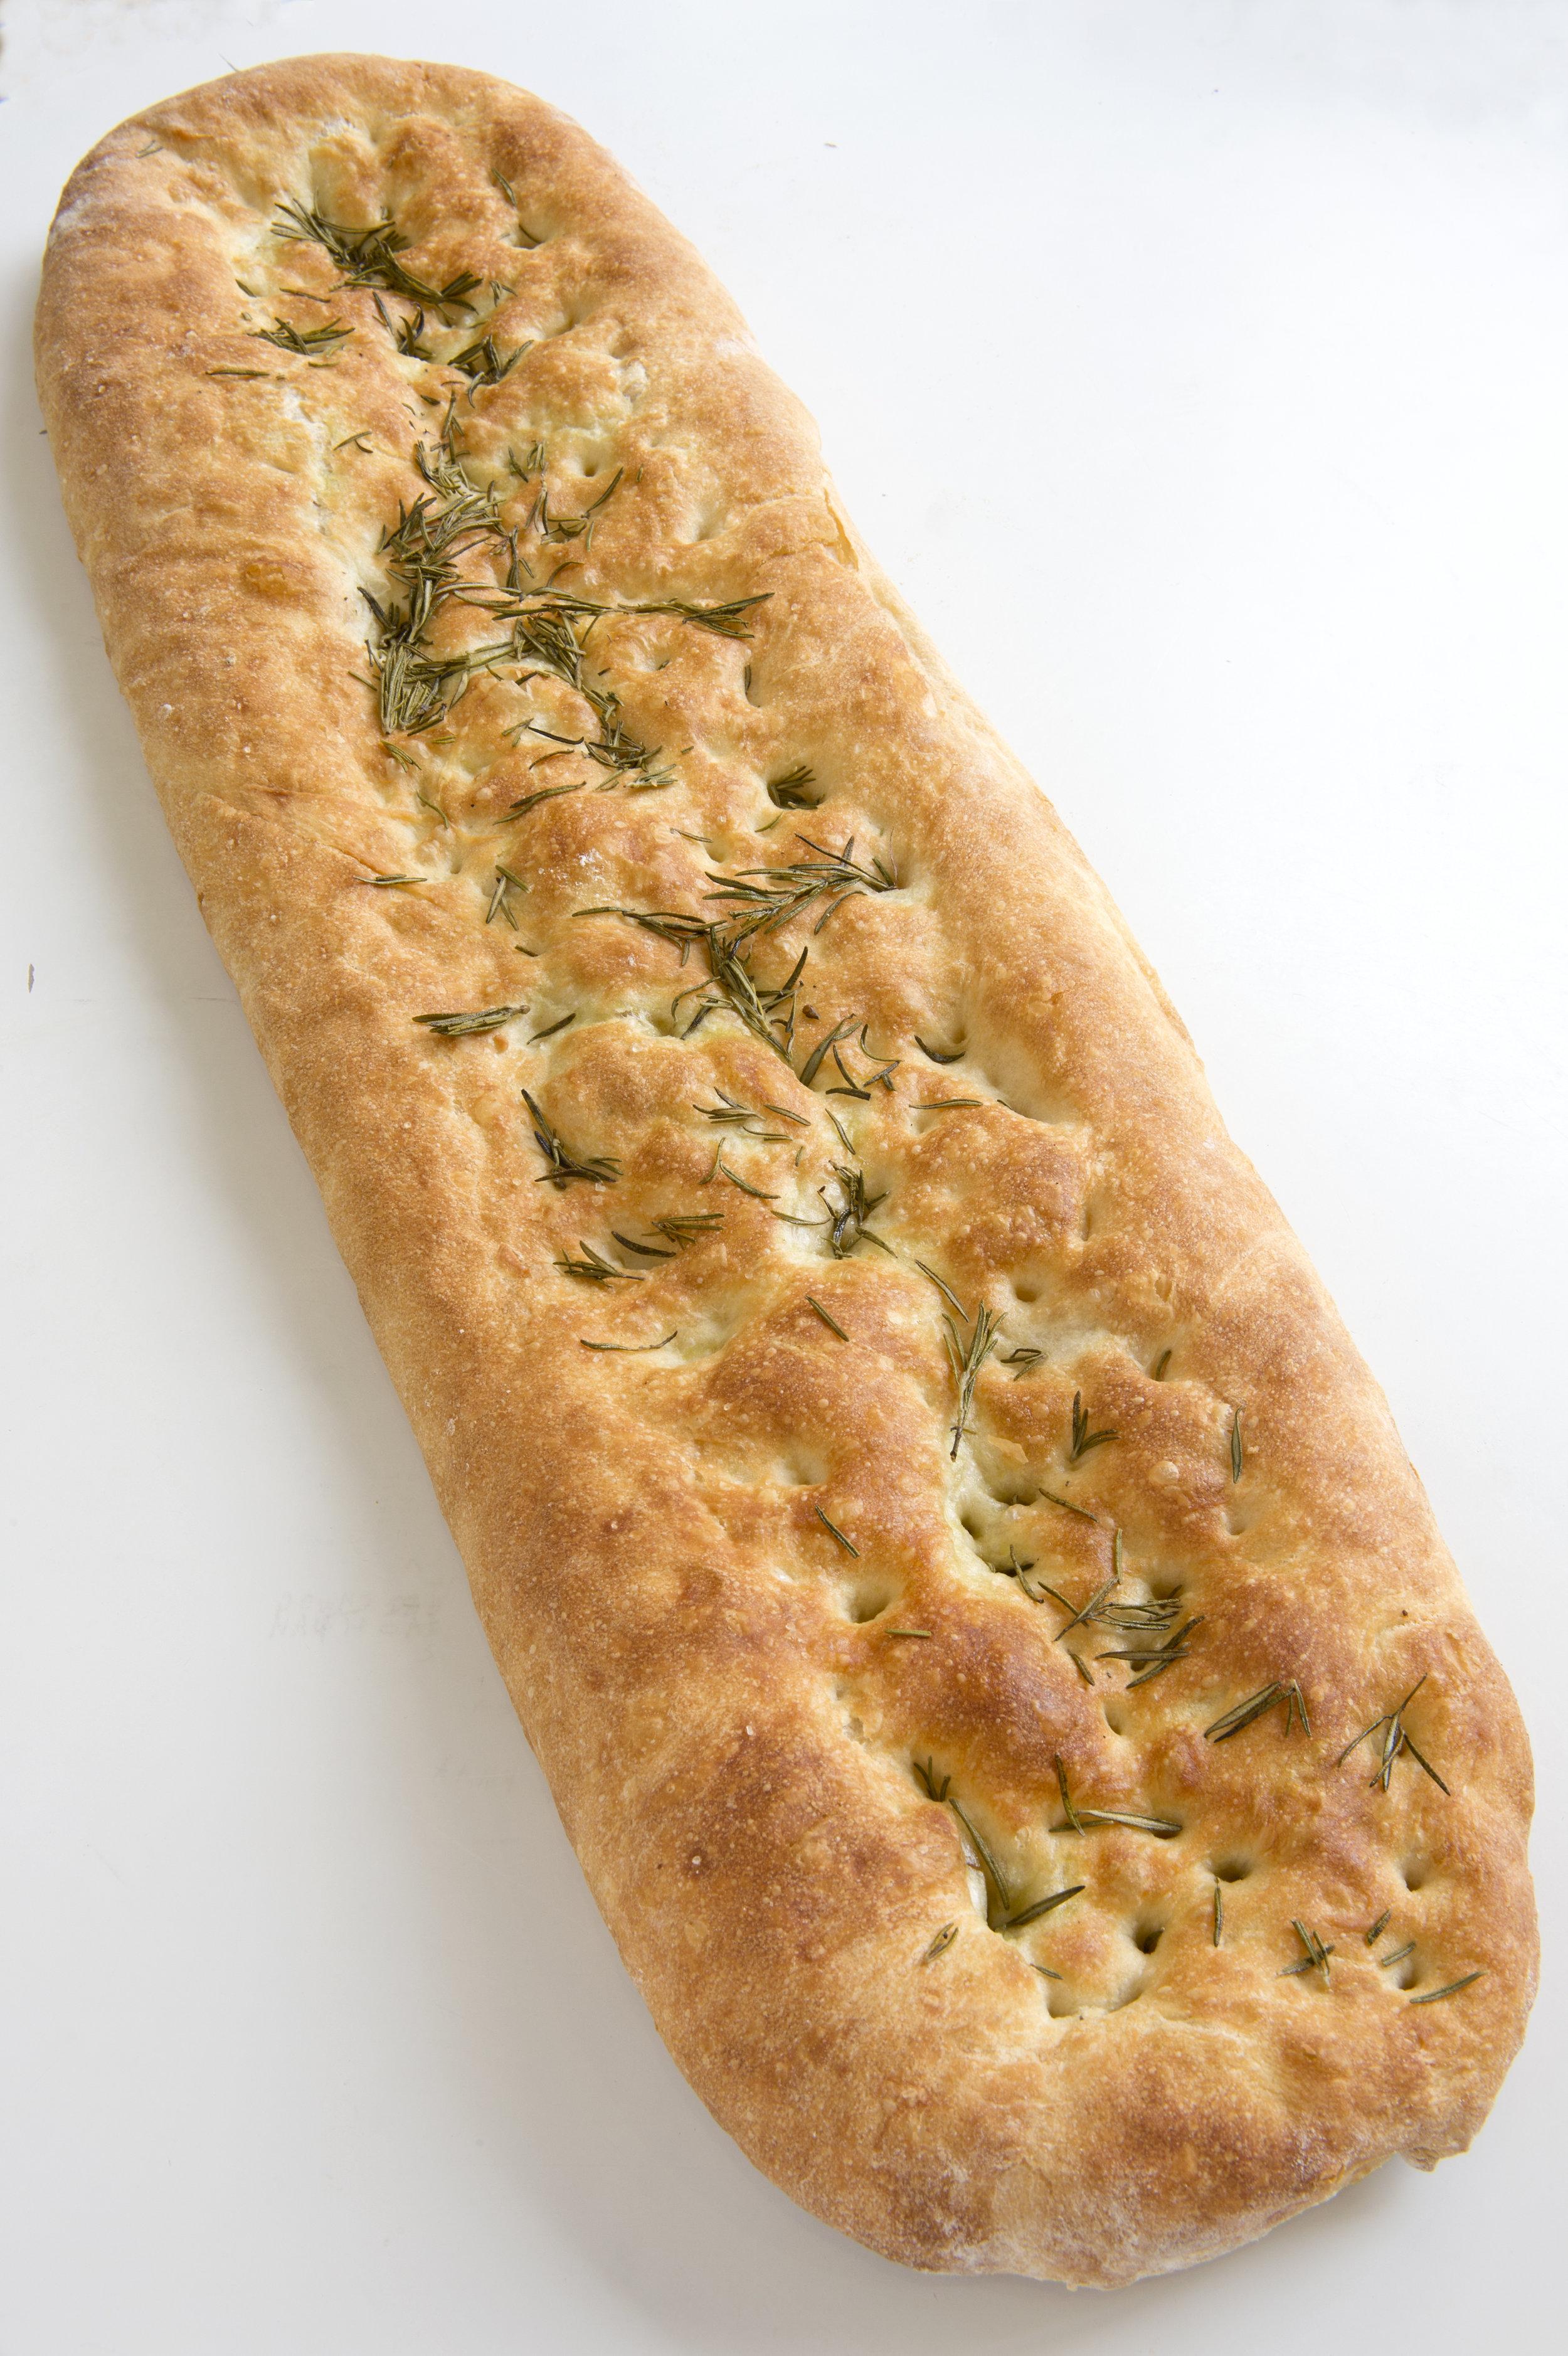 Wholesale — Grandaisy Bakery